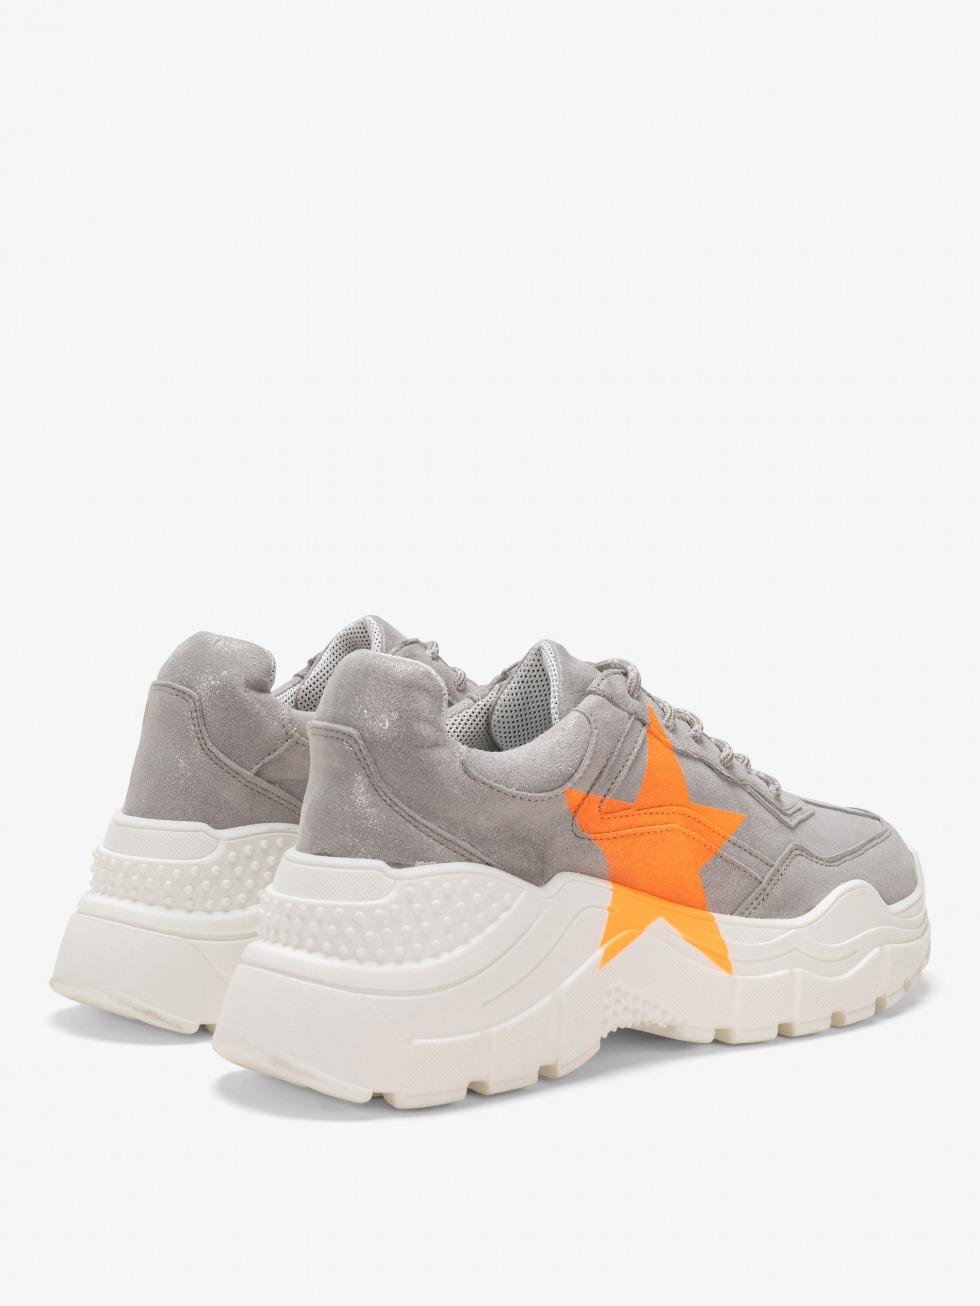 Aviations Chunky Sneakers - Stardust Neon Orange Star